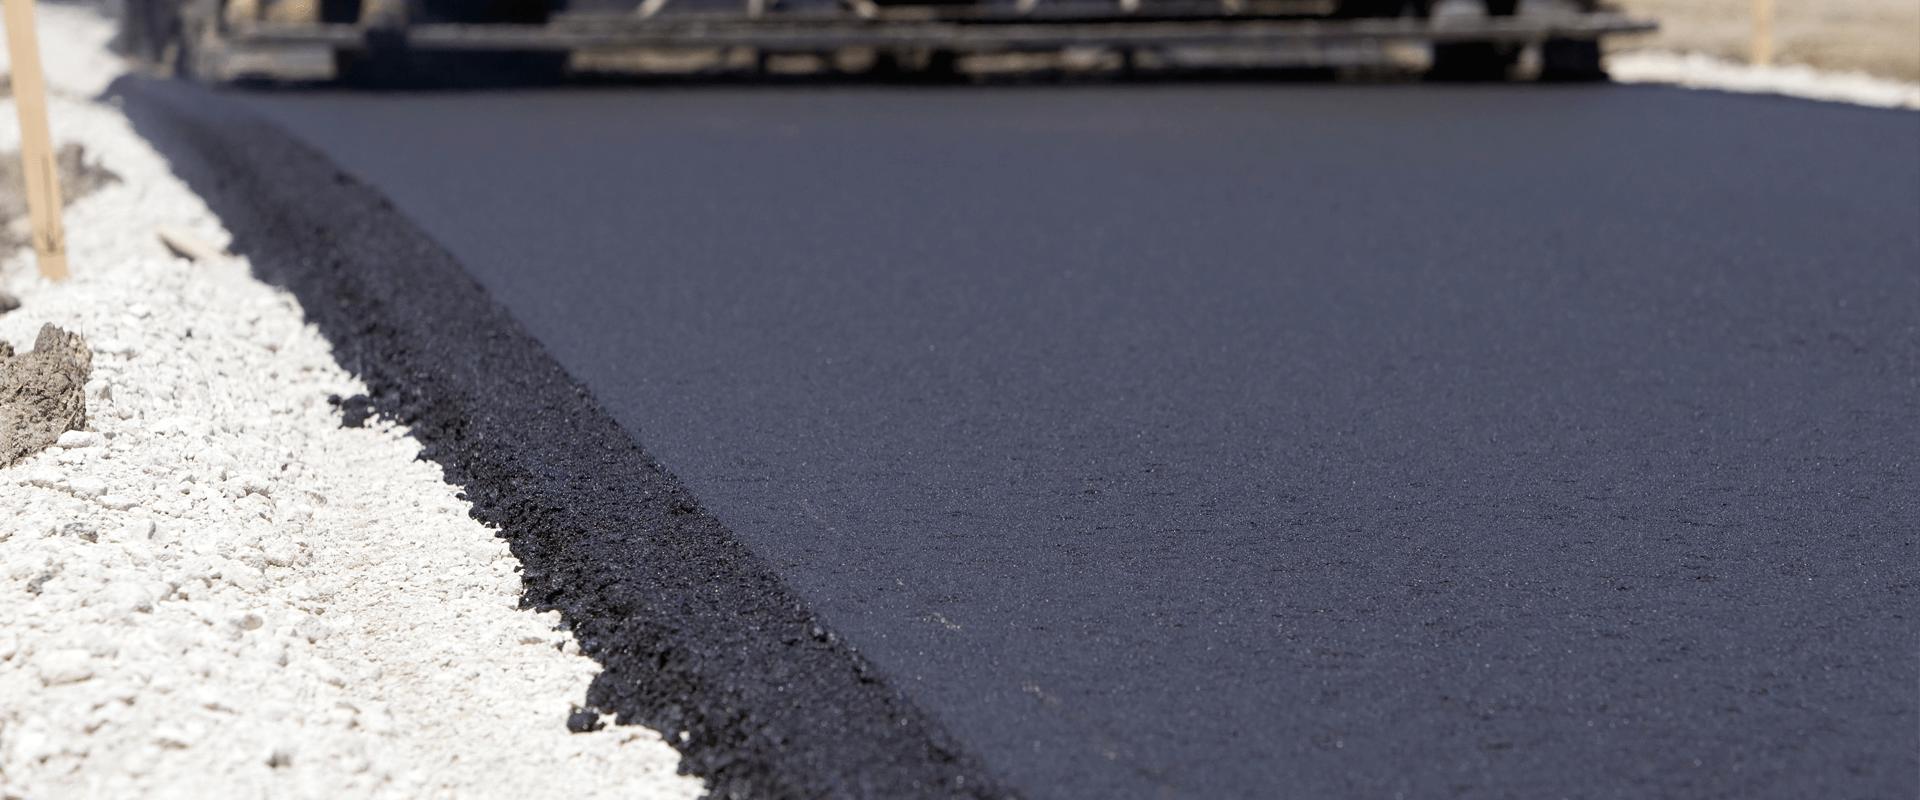 Asphalt driveway paving {{city_county}}